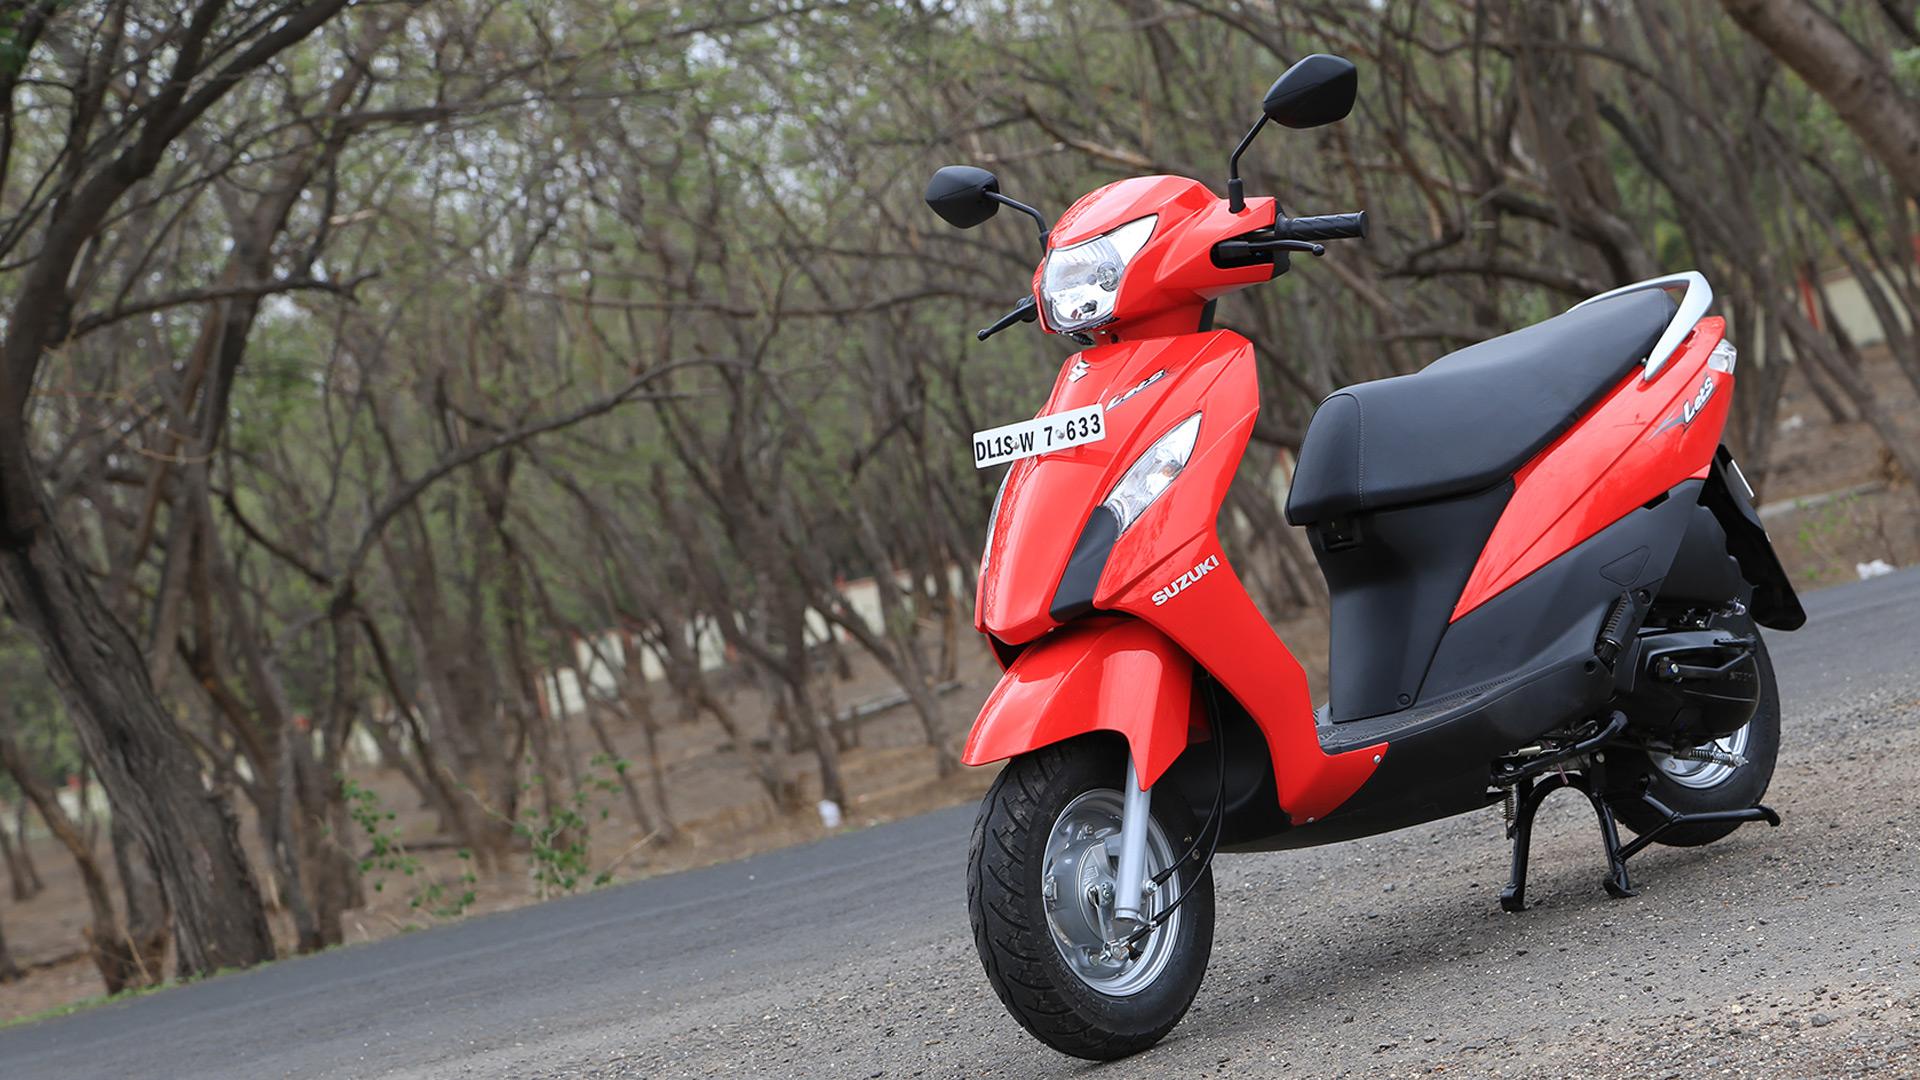 Suzuki Lets 2014 STD Compare